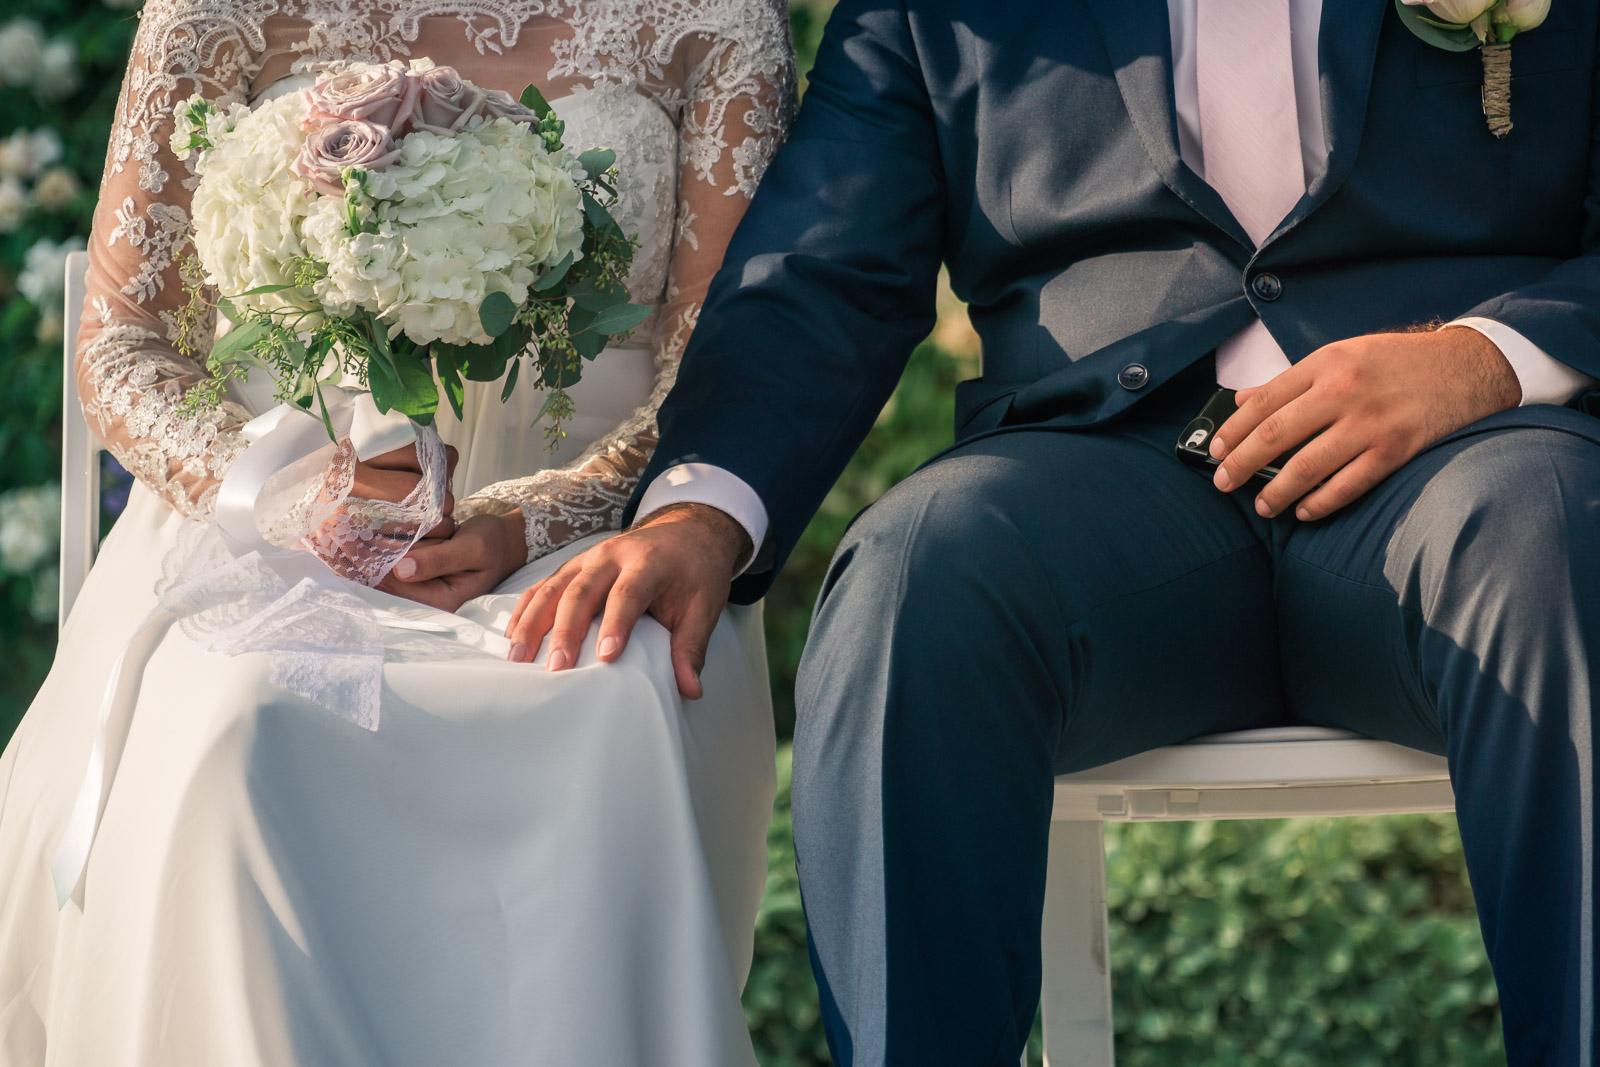 192_Angel-Brea-Orange-County_Joseph-Barber-Wedding-Photography.jpg